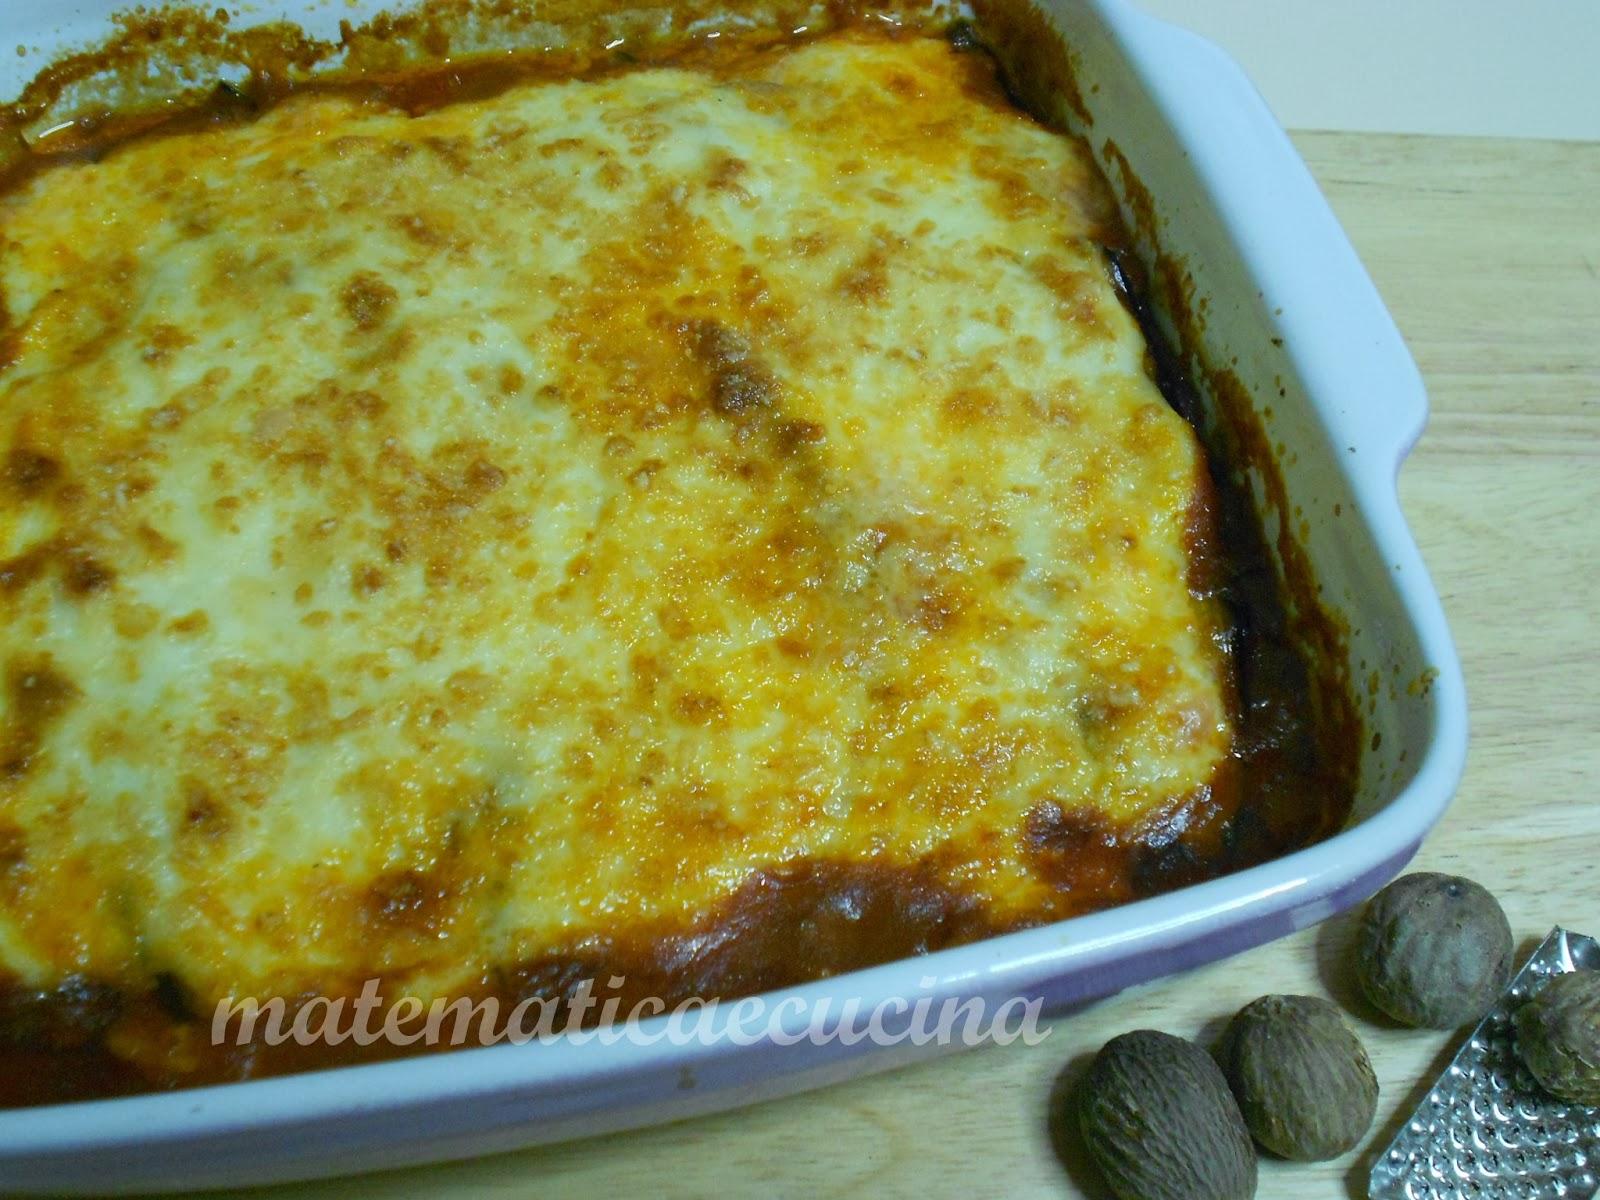 ricette greche: moussaka senza patate